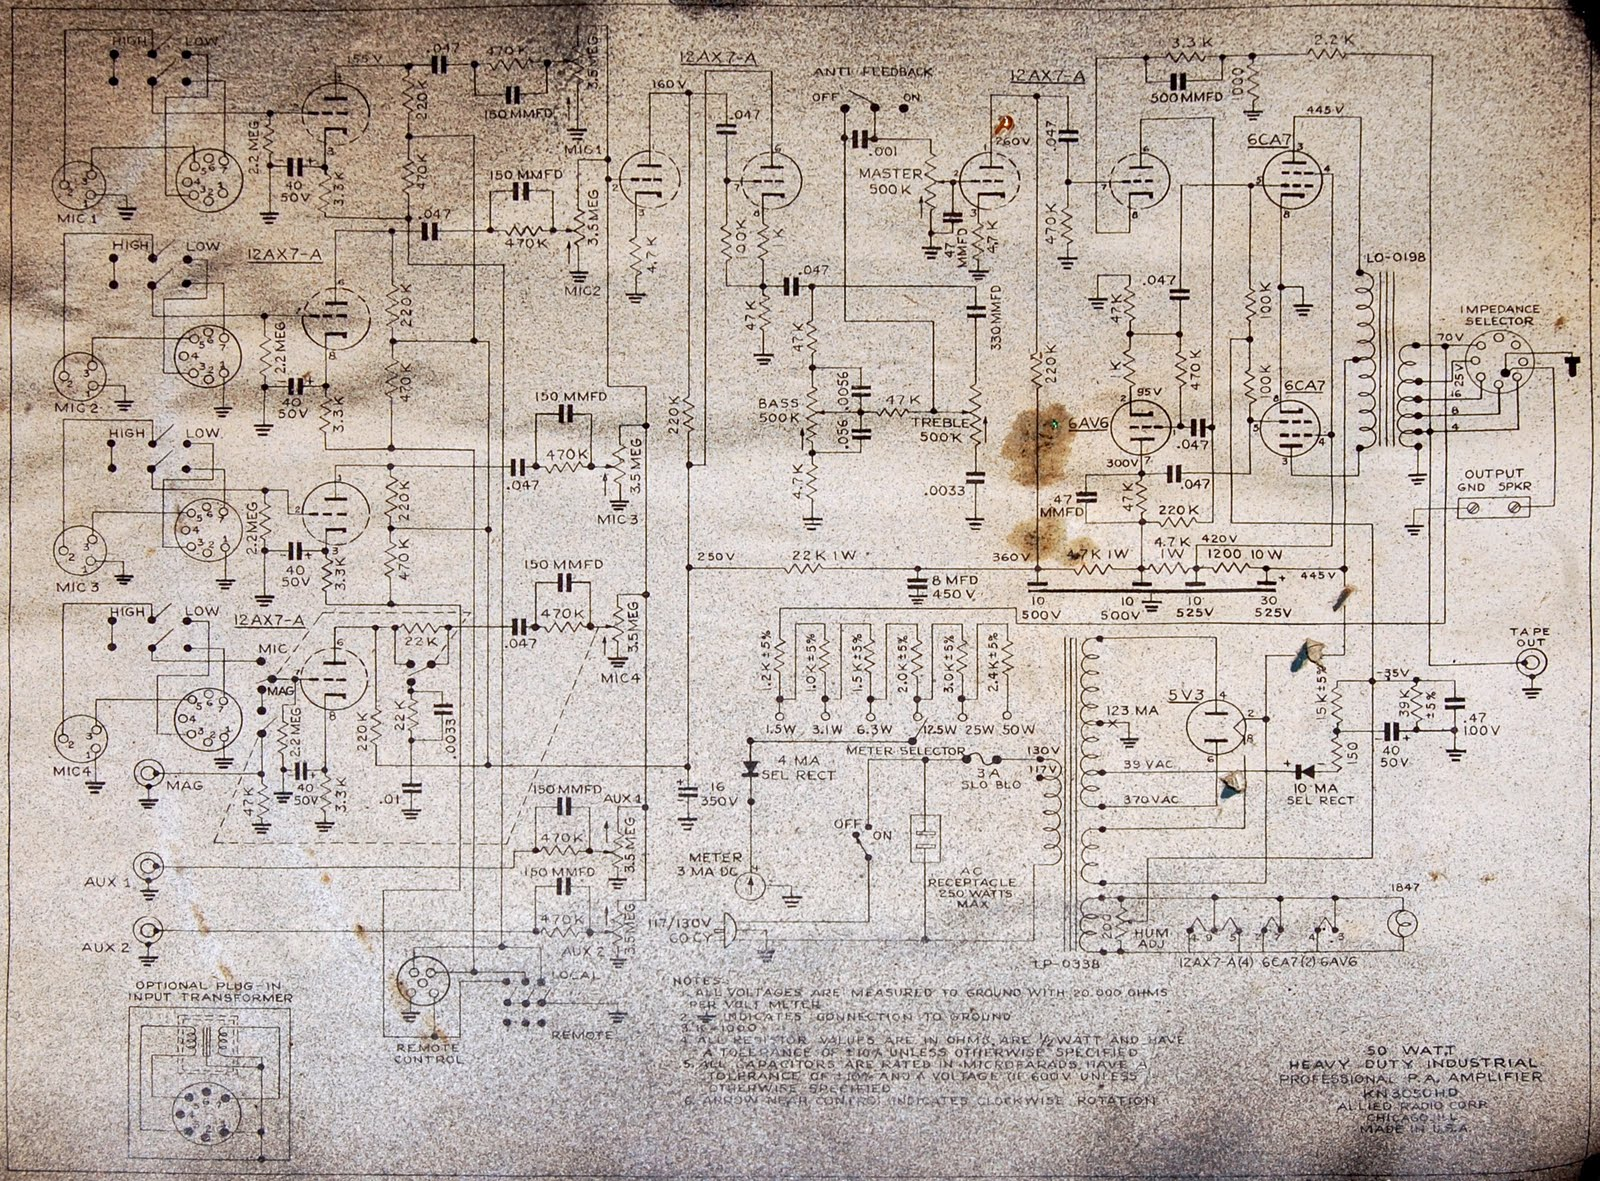 kustom amp schematics  kustom  get free image about wiring